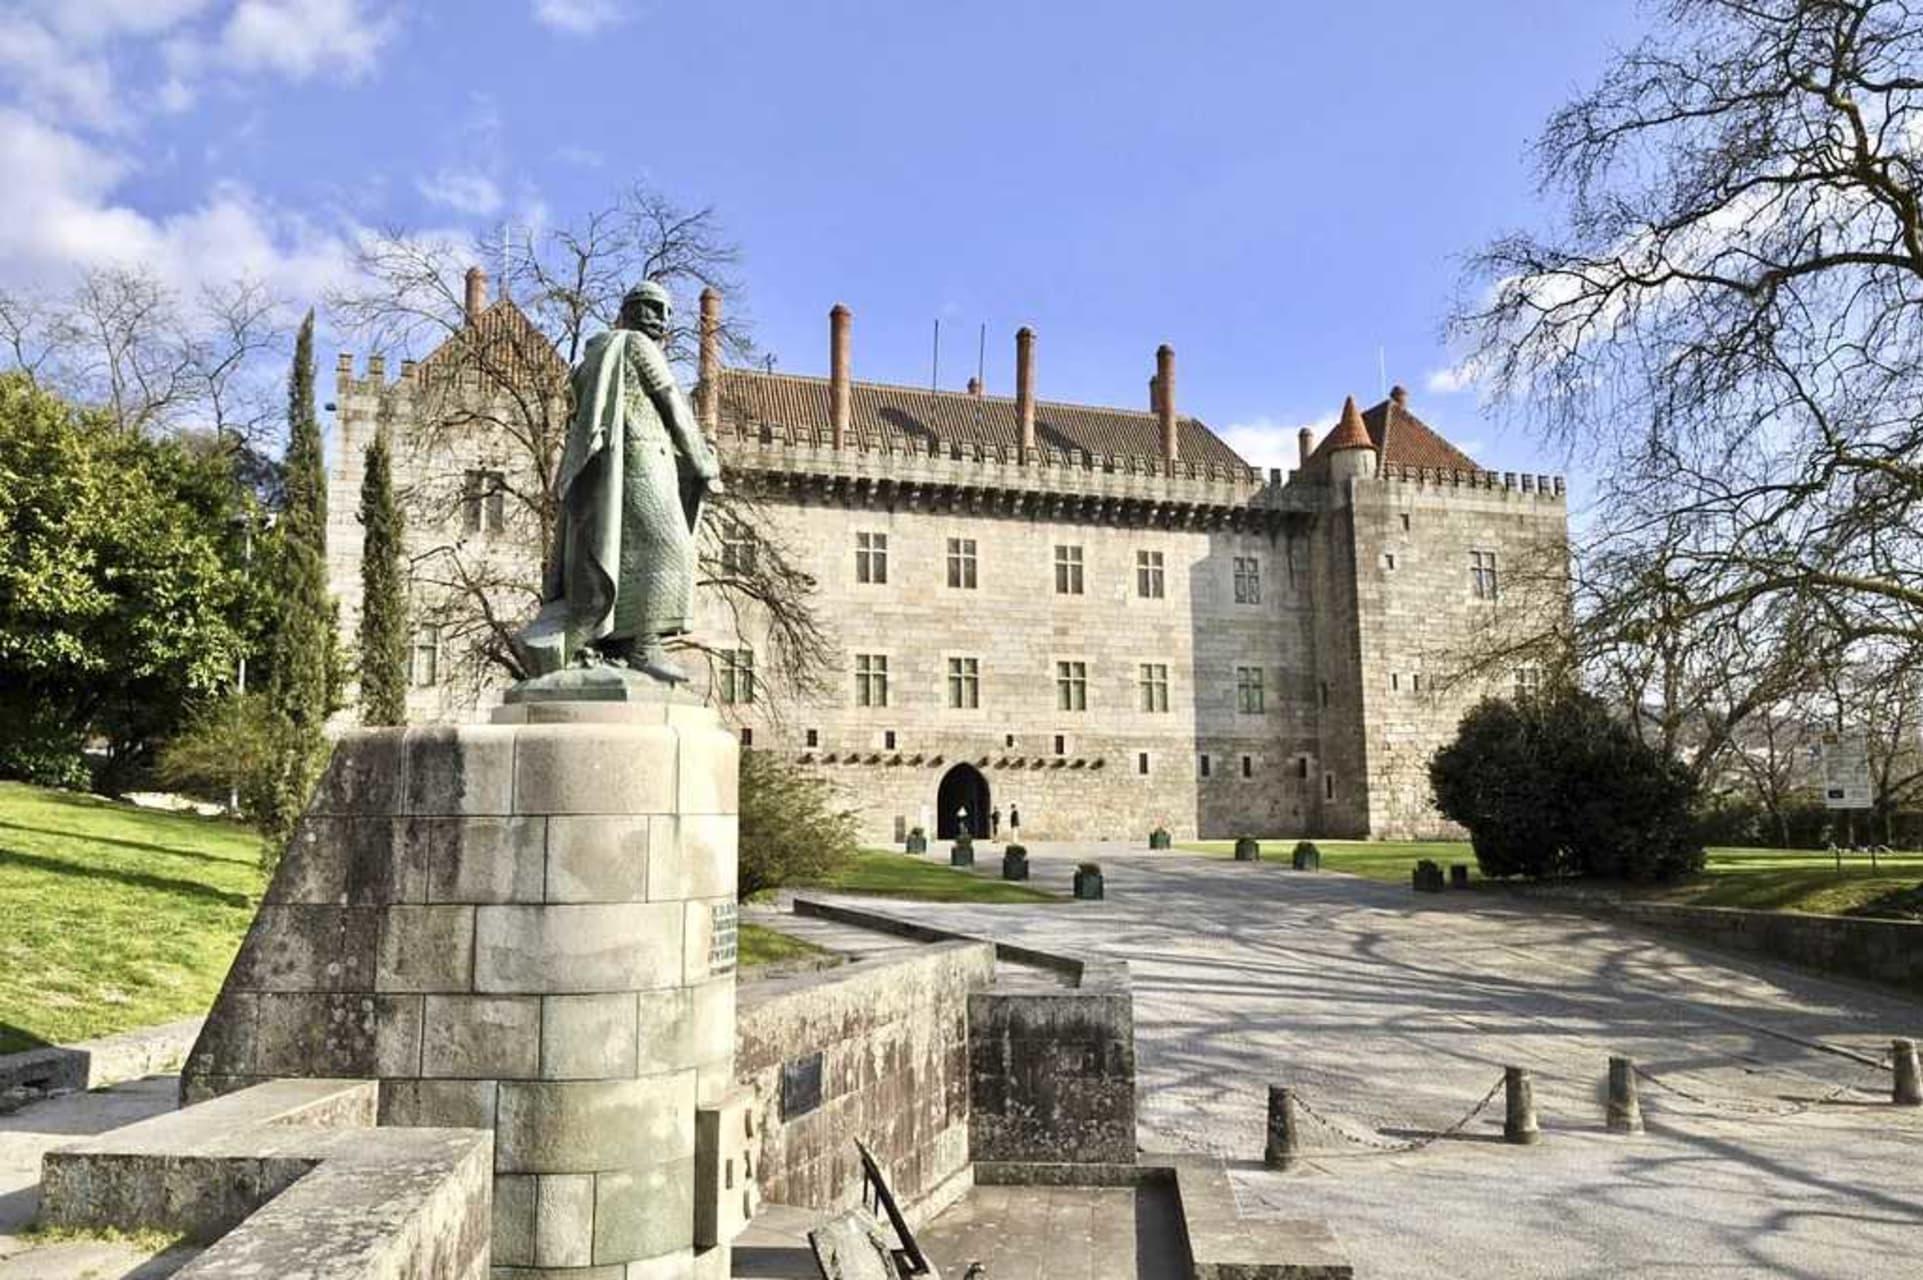 Guimarães - Guimarães, the Cradle of Portugal